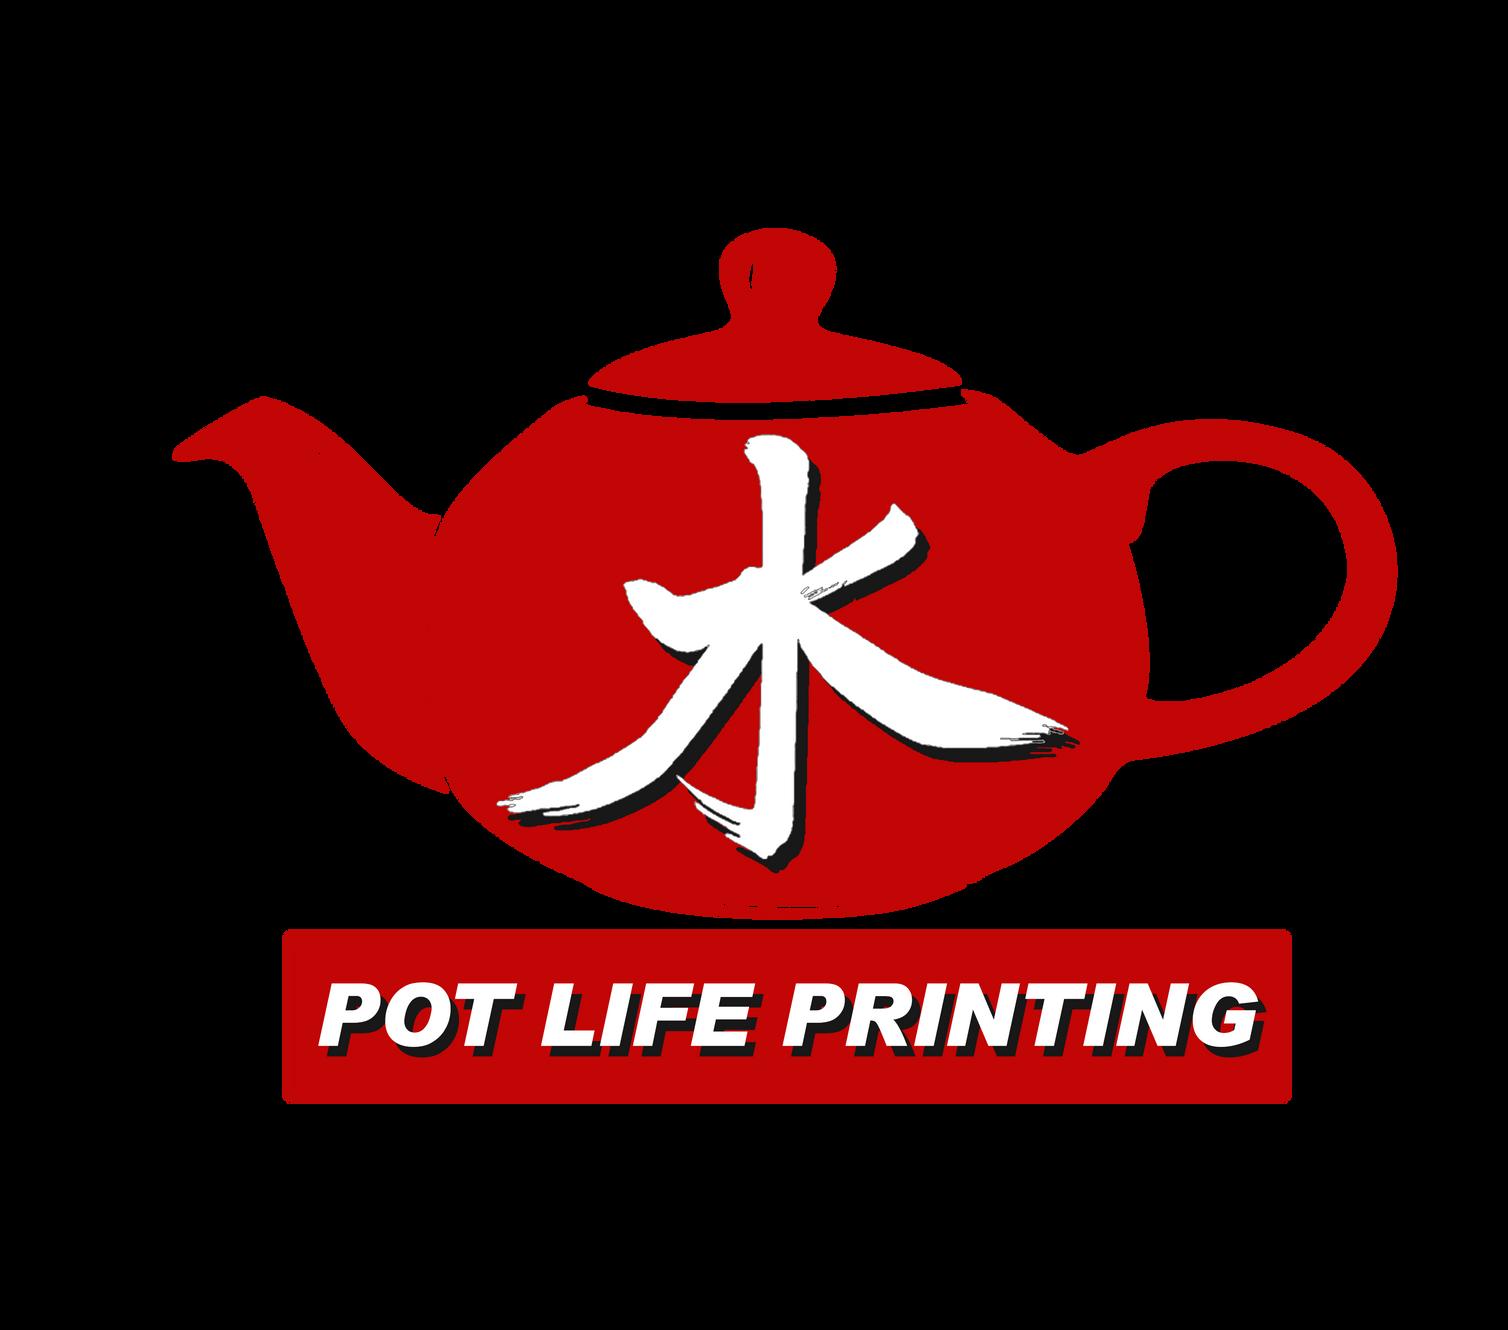 Pokemon Go Plus Stickers Potlifeprinting